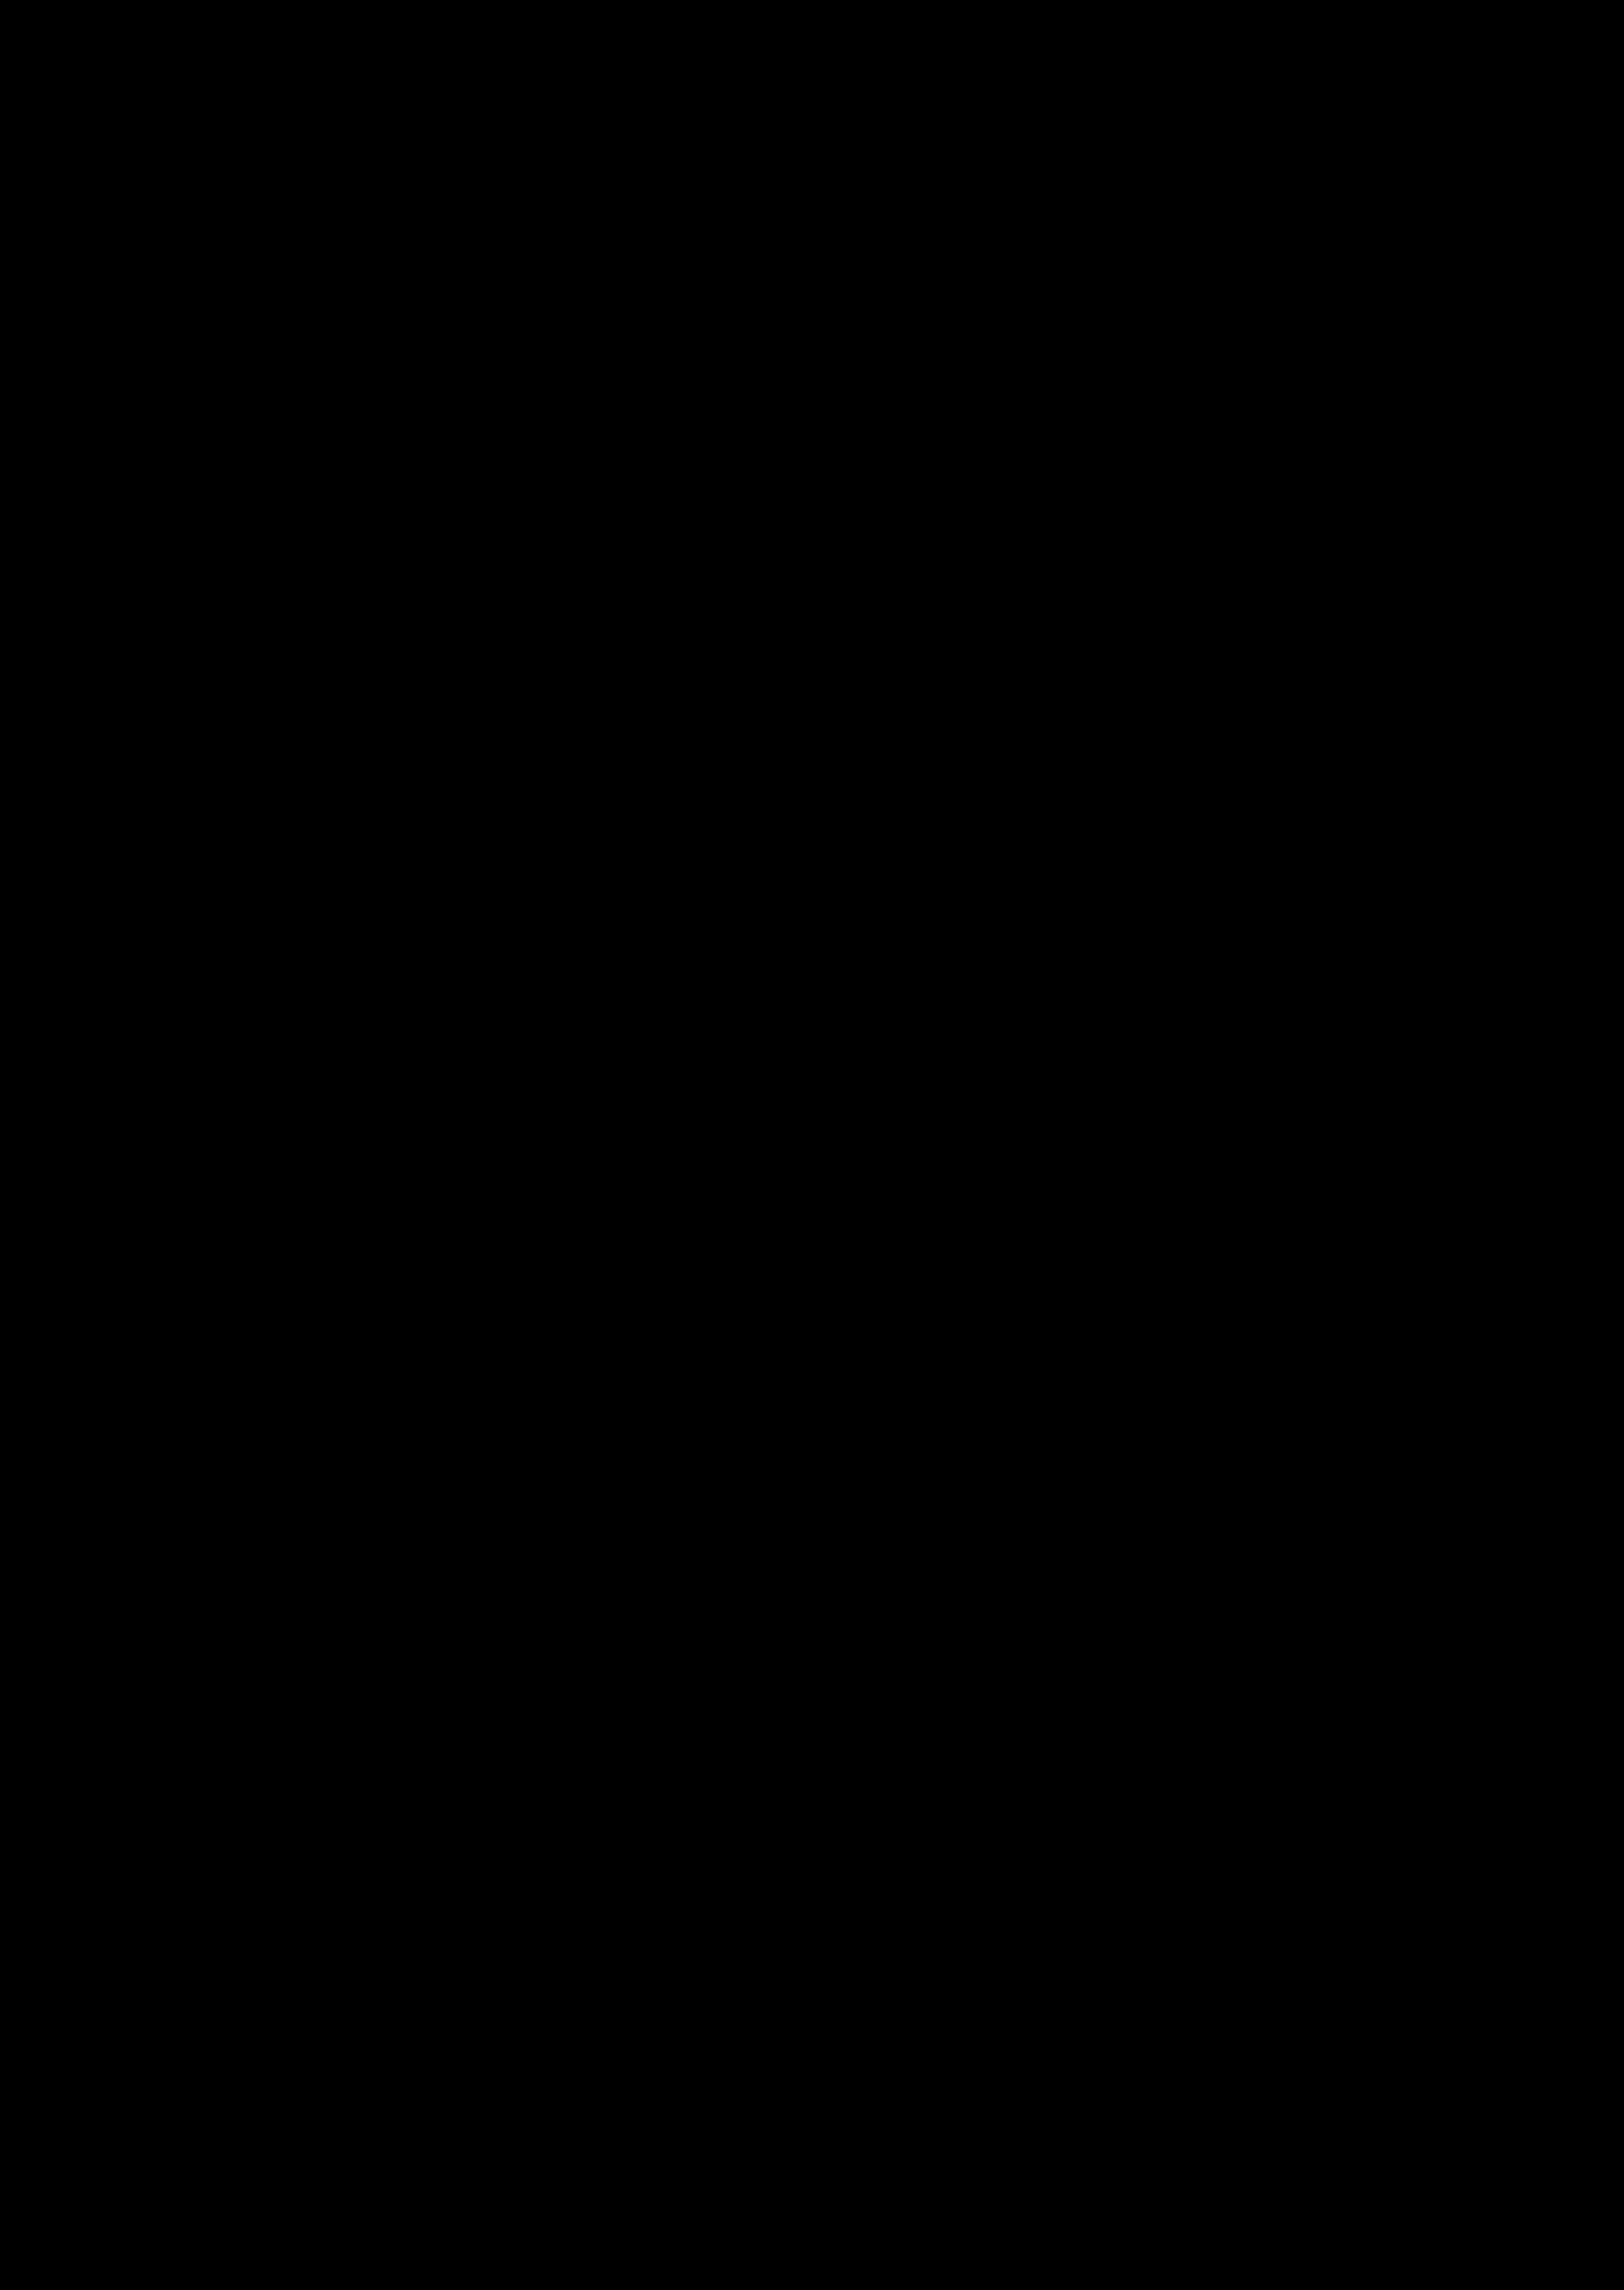 Marco Grunge Vector Png Download Grunge A4 Border.